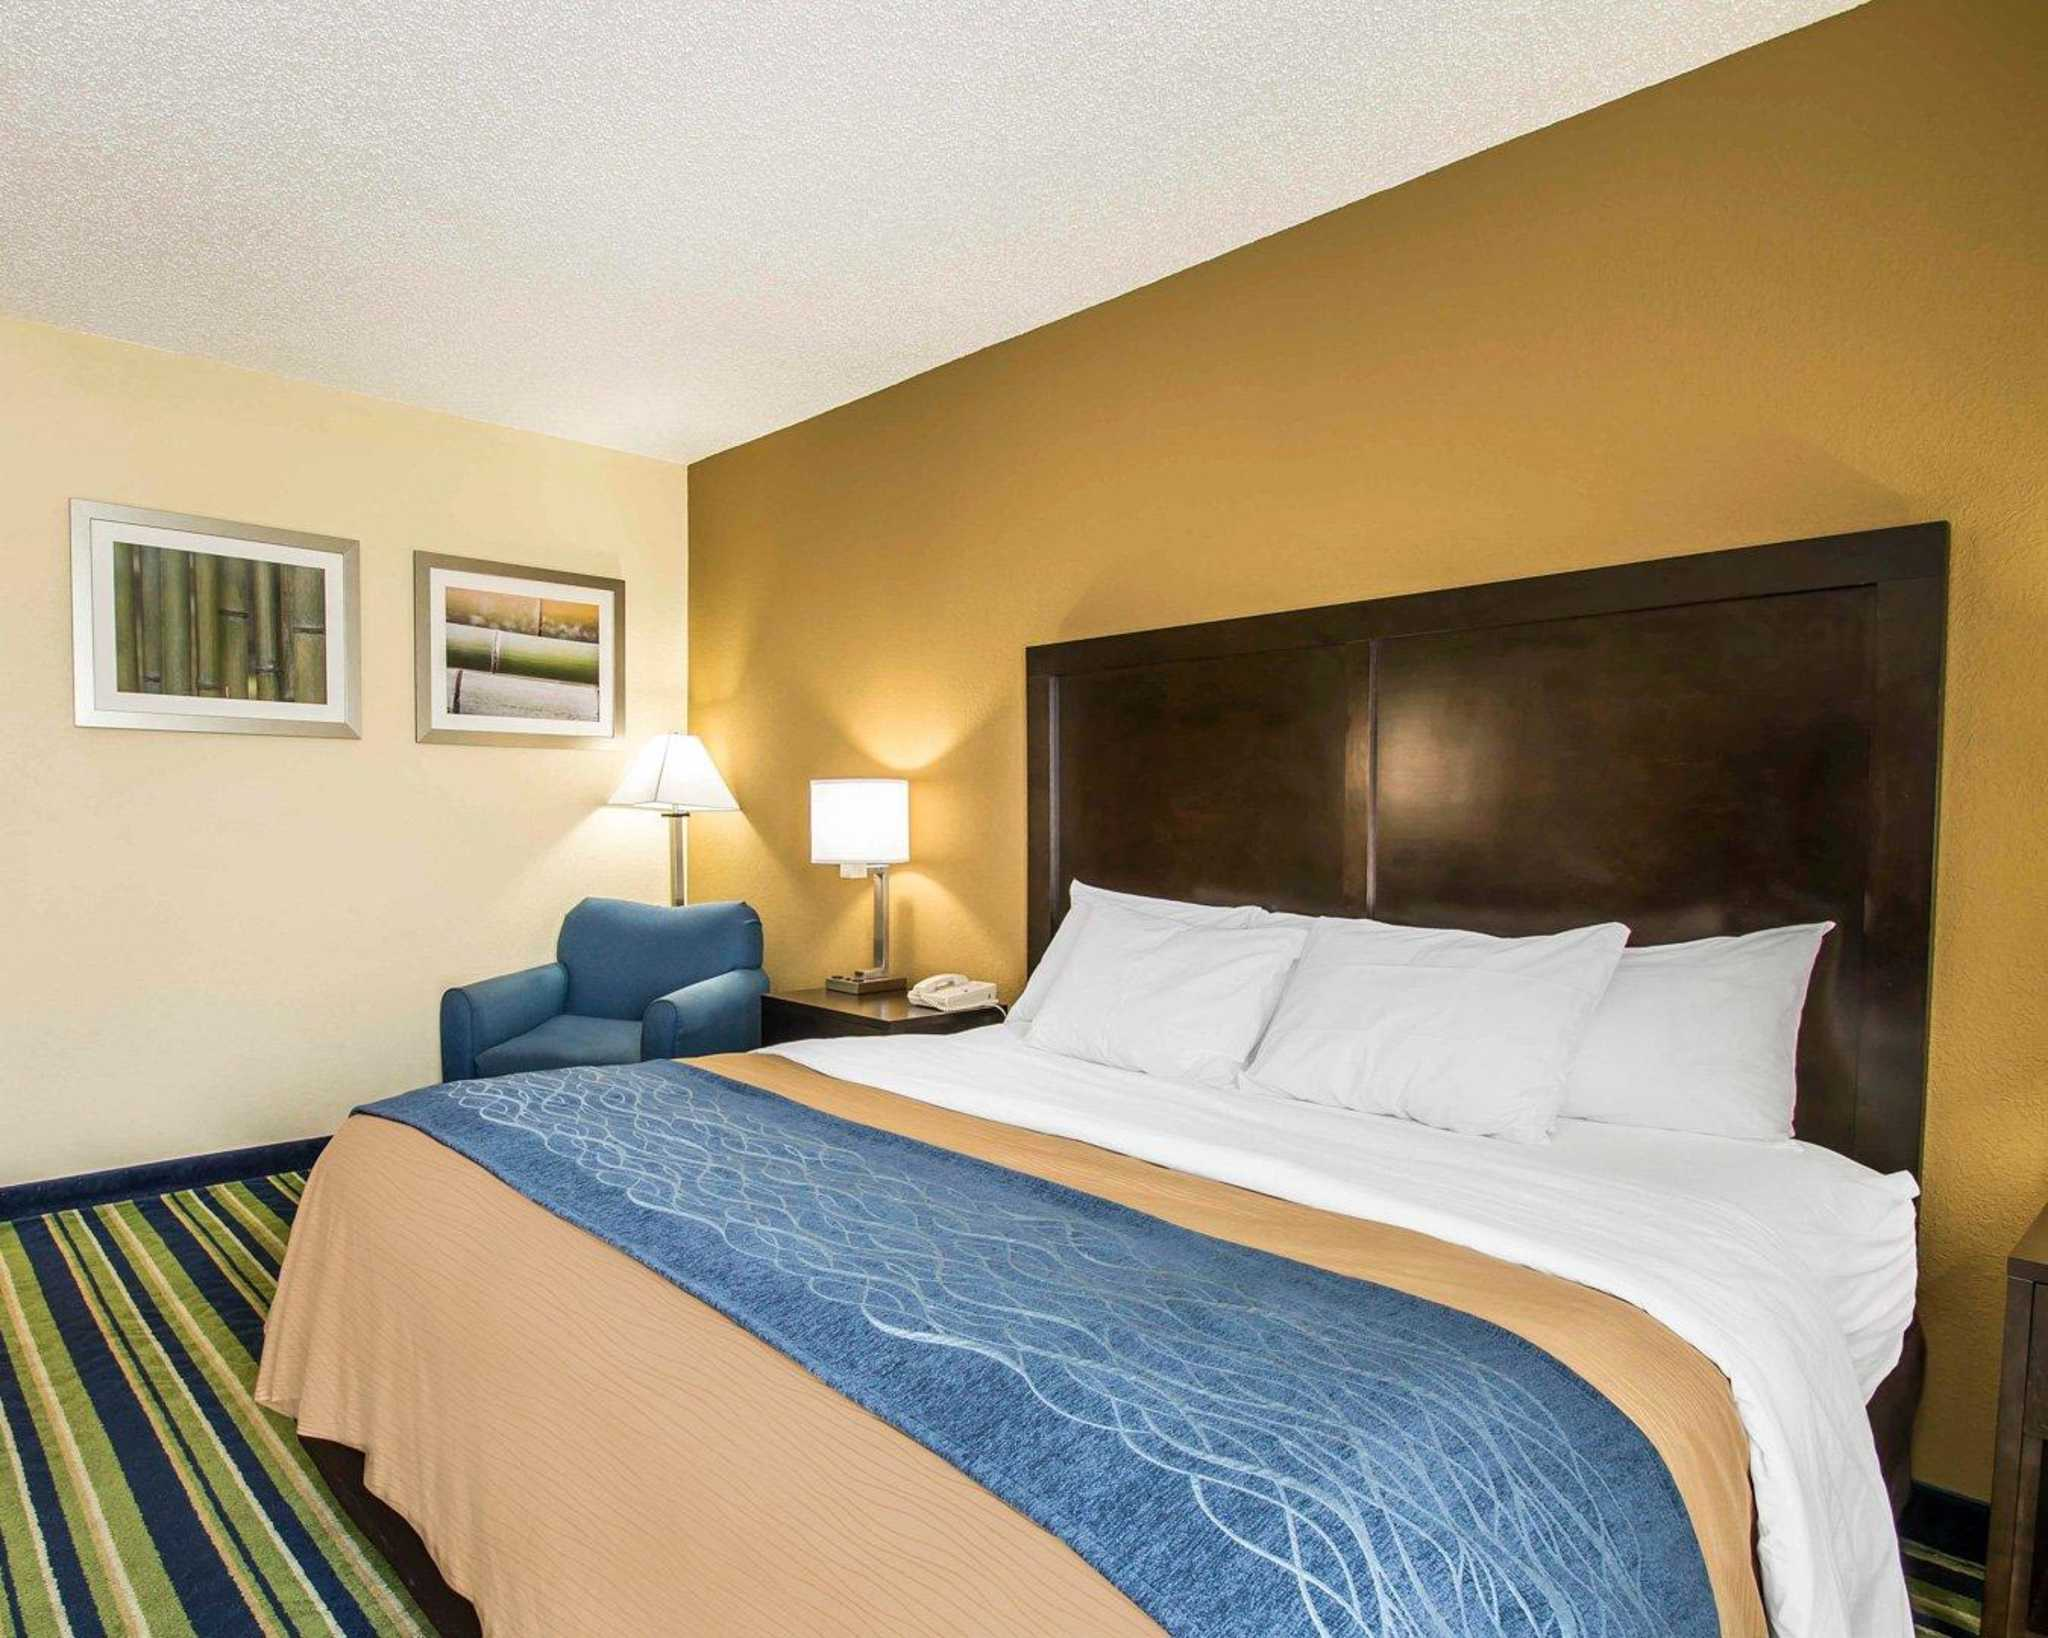 Comfort Inn & Suites Lantana - West Palm Beach South image 7